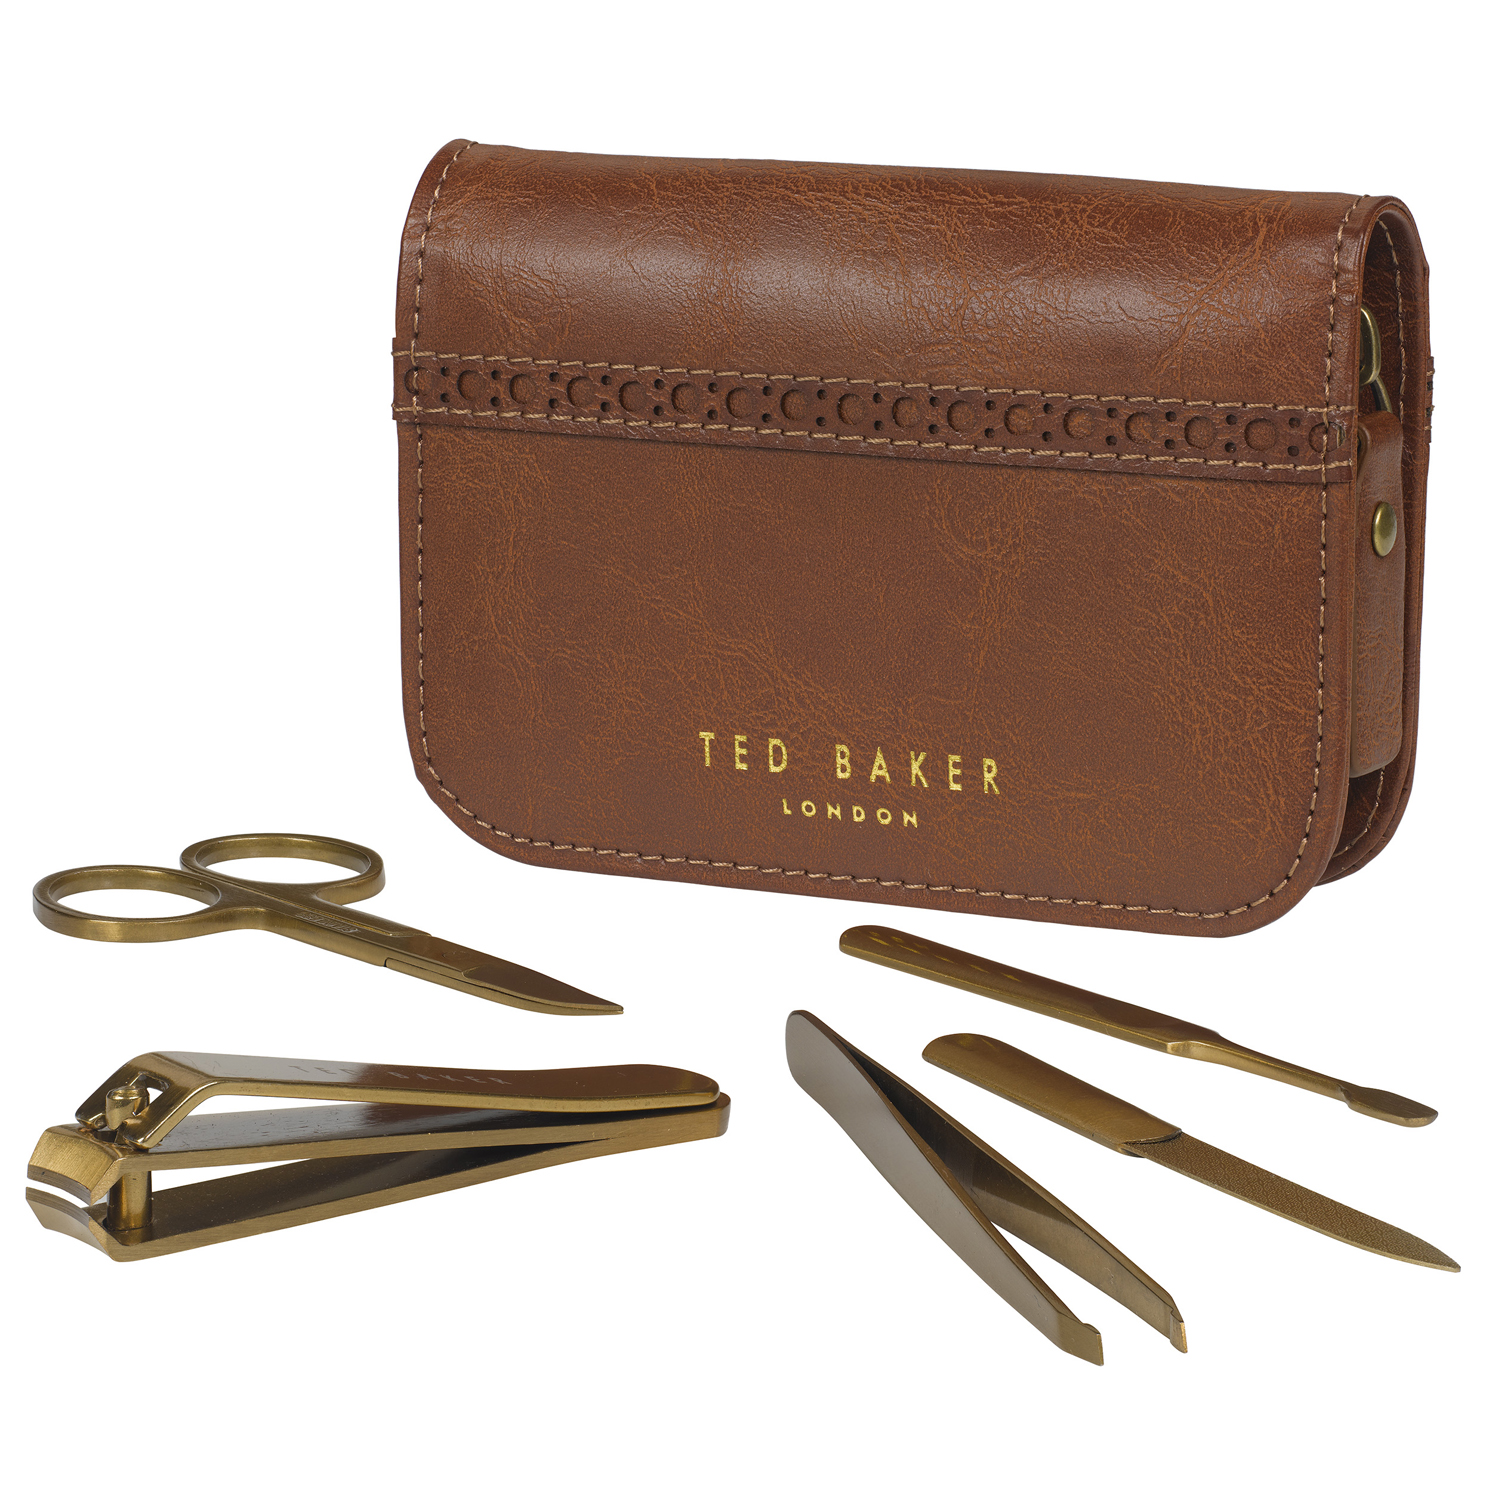 Ted Baker – 5 Piece Manicure Set in Brown Brogue Zip Around Case